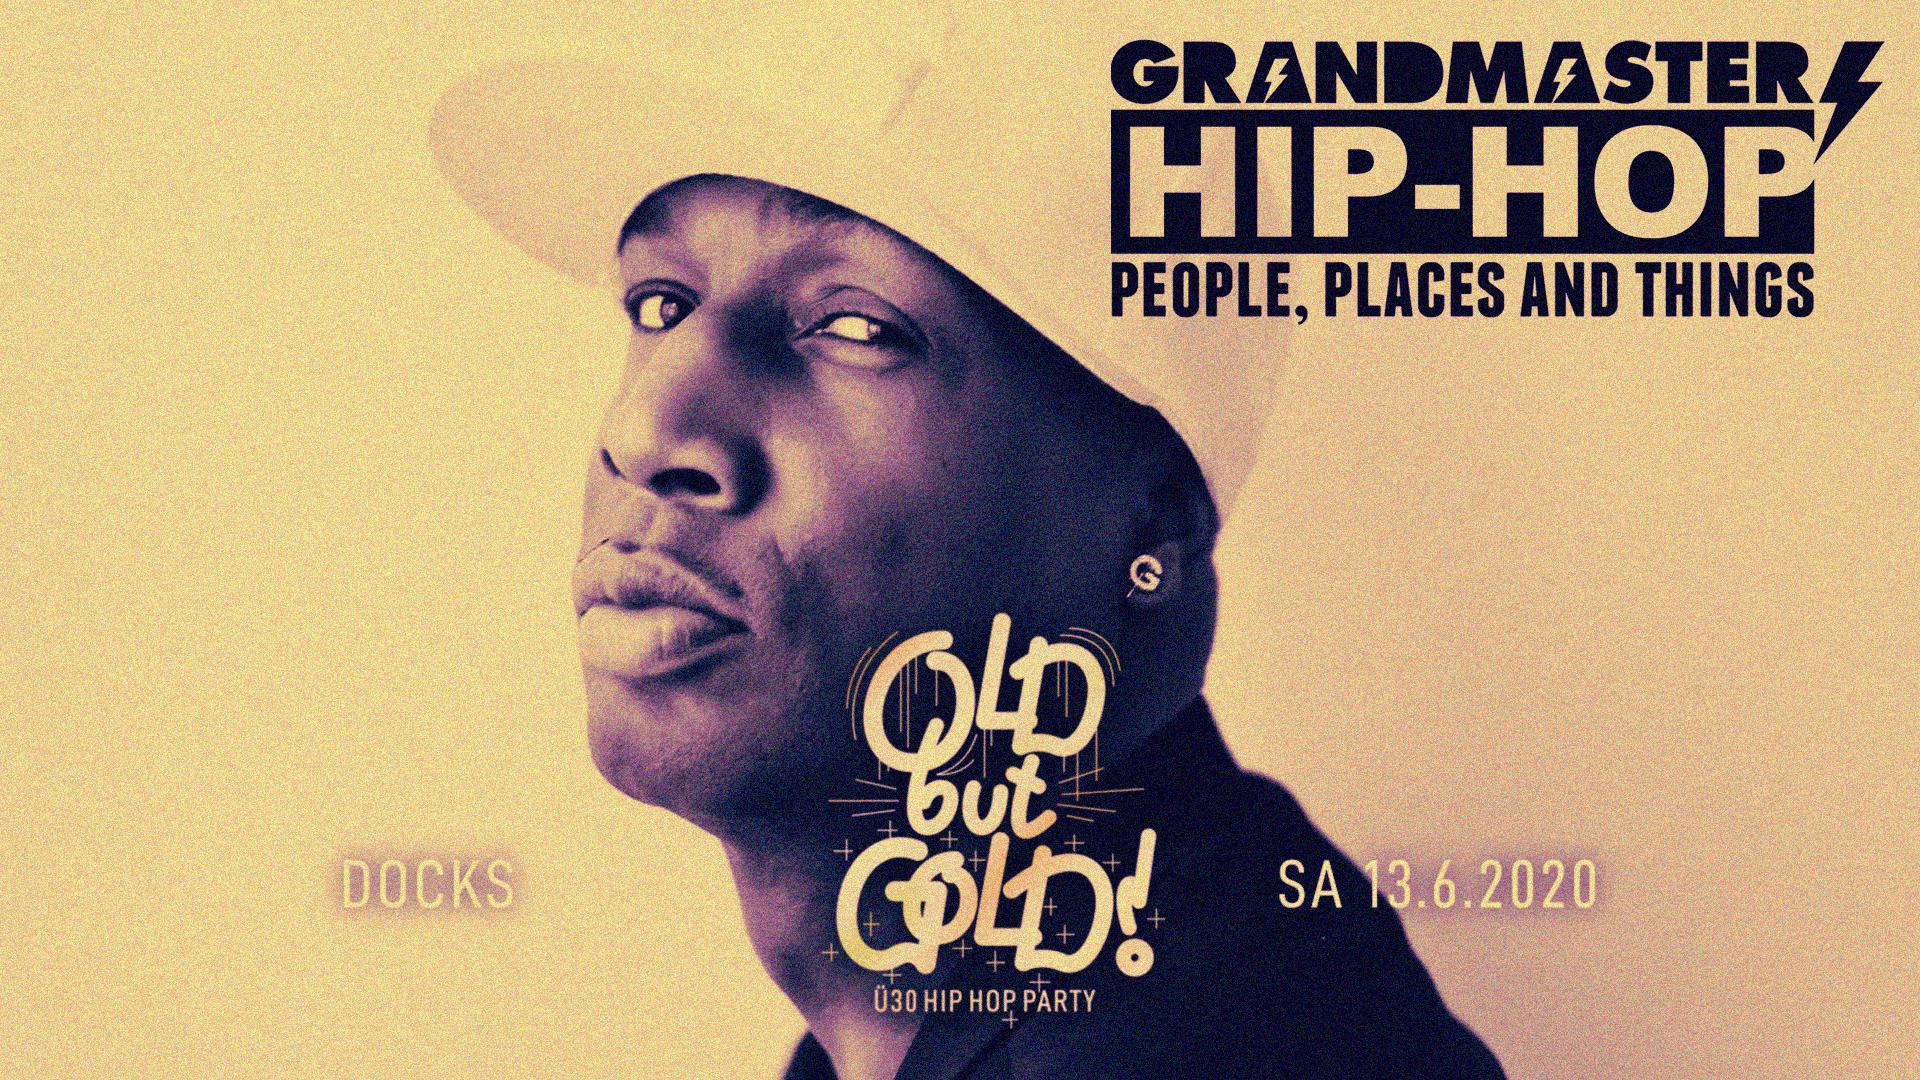 Old but Gold - Ü30 Hip Hop Party w/ Grandmaster Flash, DJ Dynamite & more